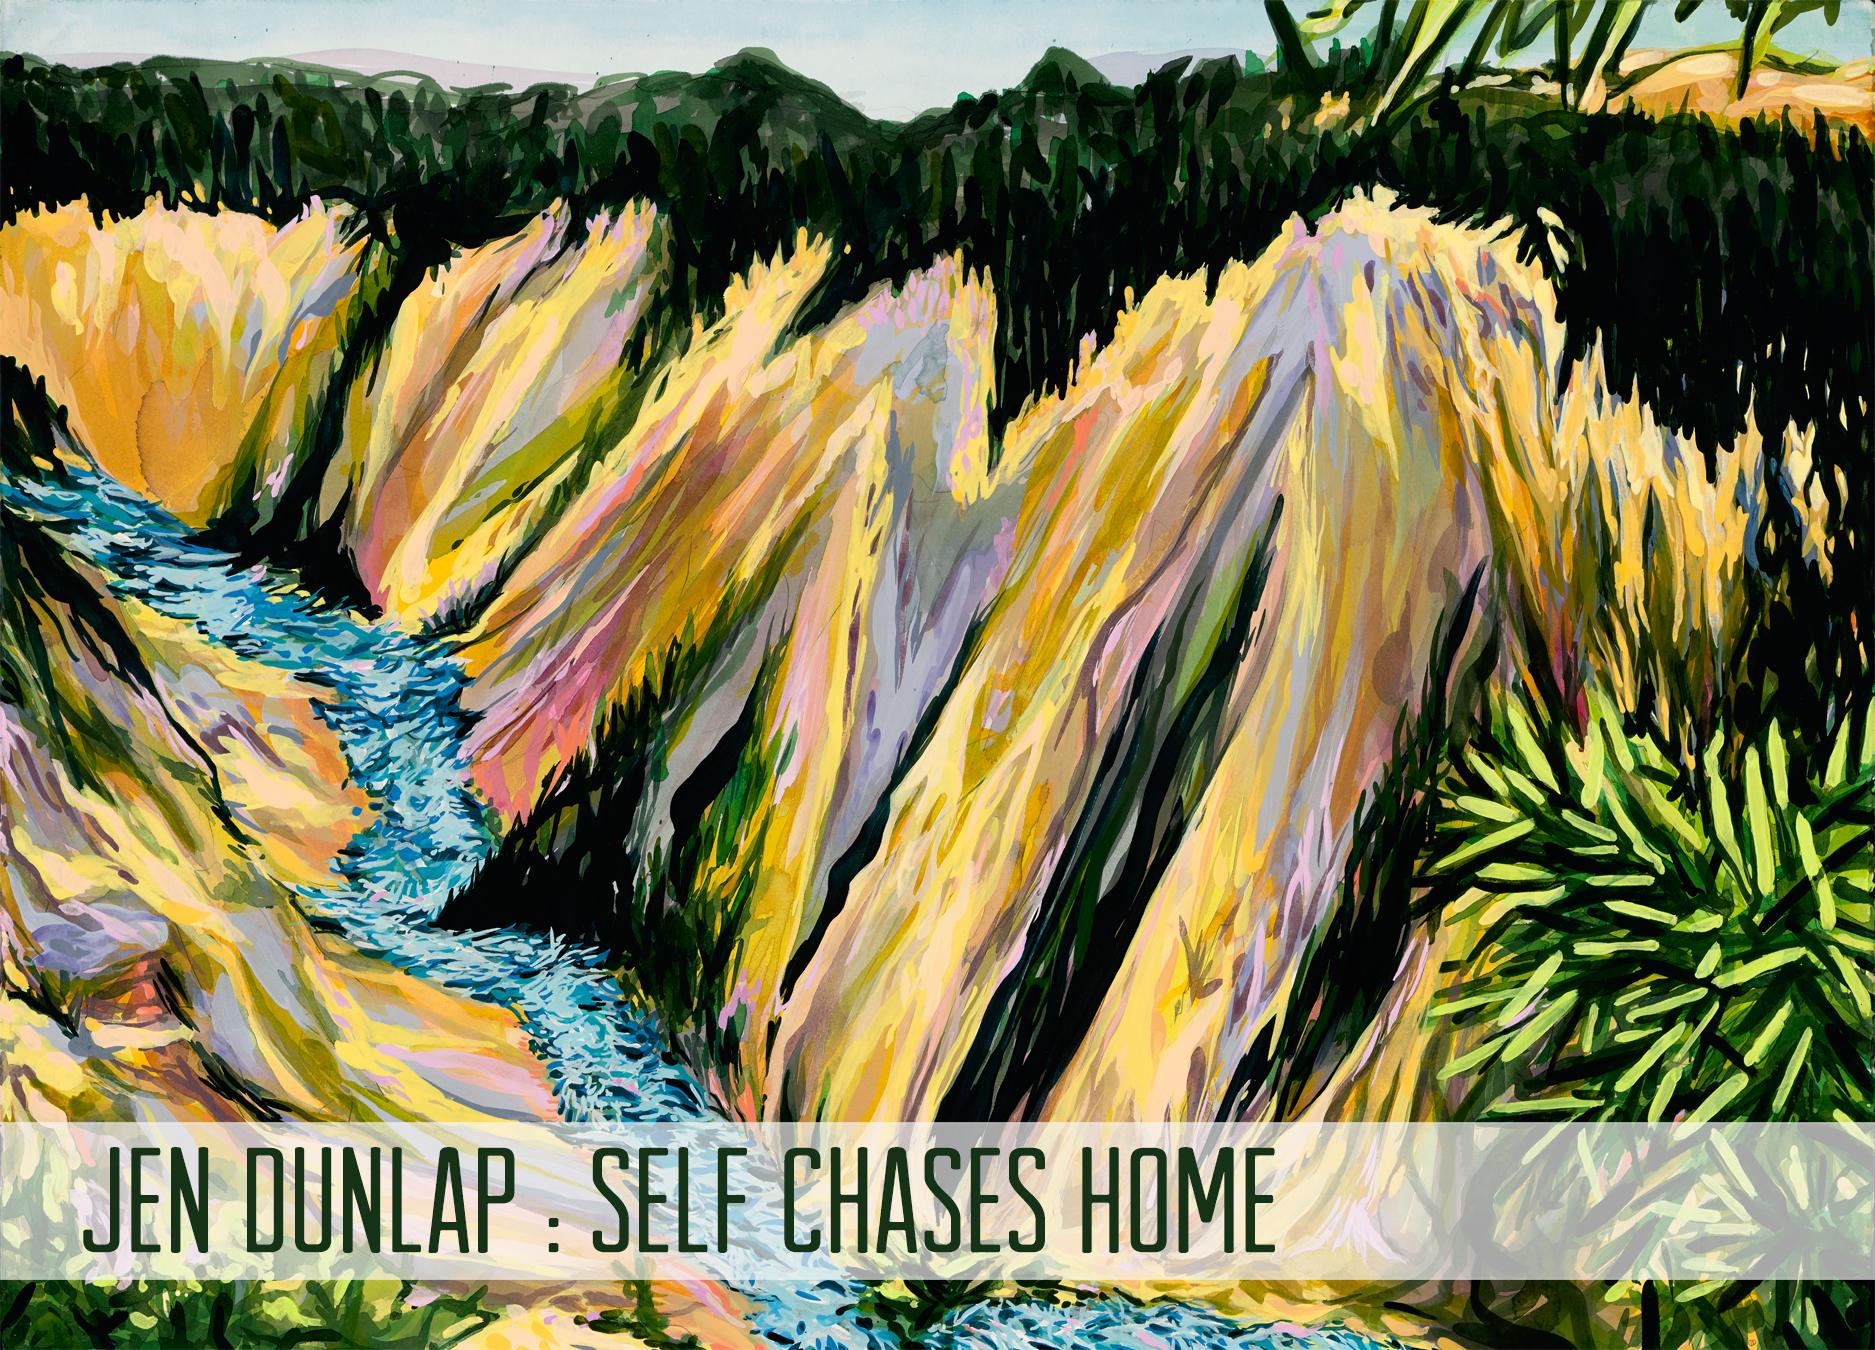 Self Chases Home Art Exhibit